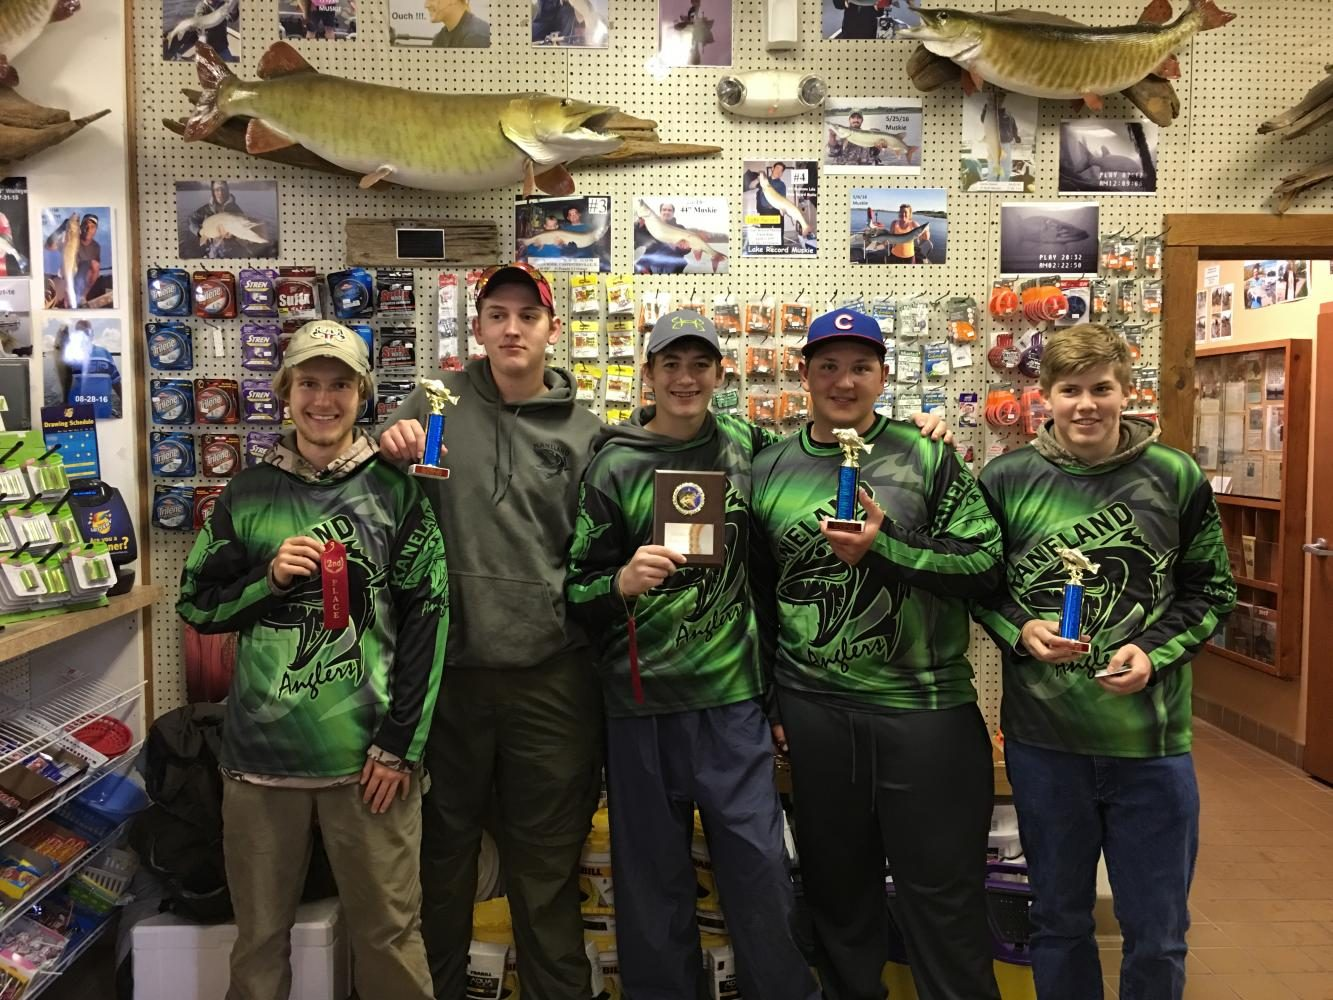 Bass Fishing Club Casts into Their Season